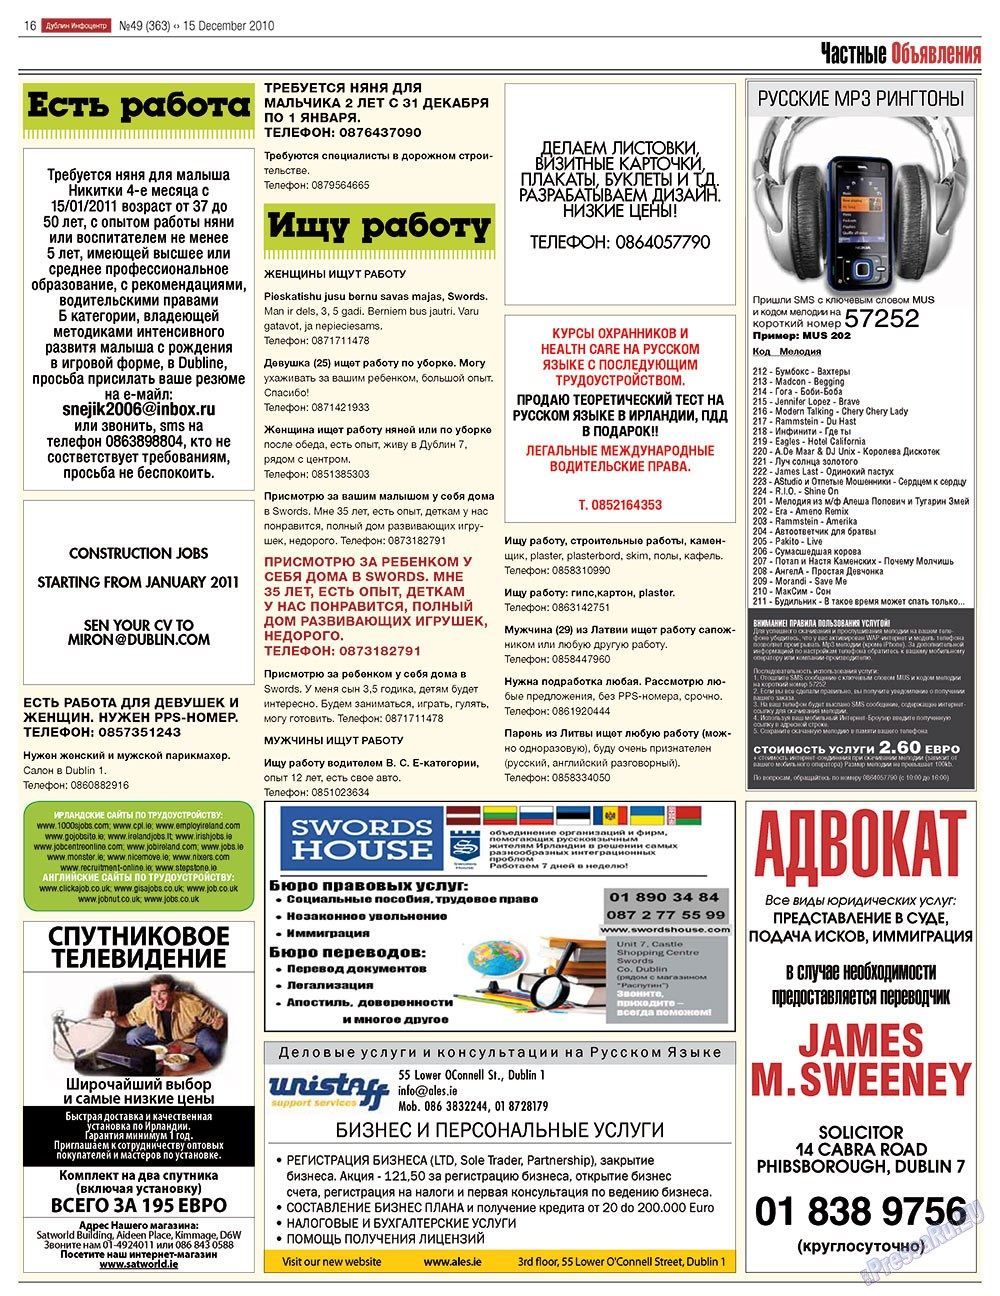 Дублин инфоцентр (газета). 2010 год, номер 49, стр. 16